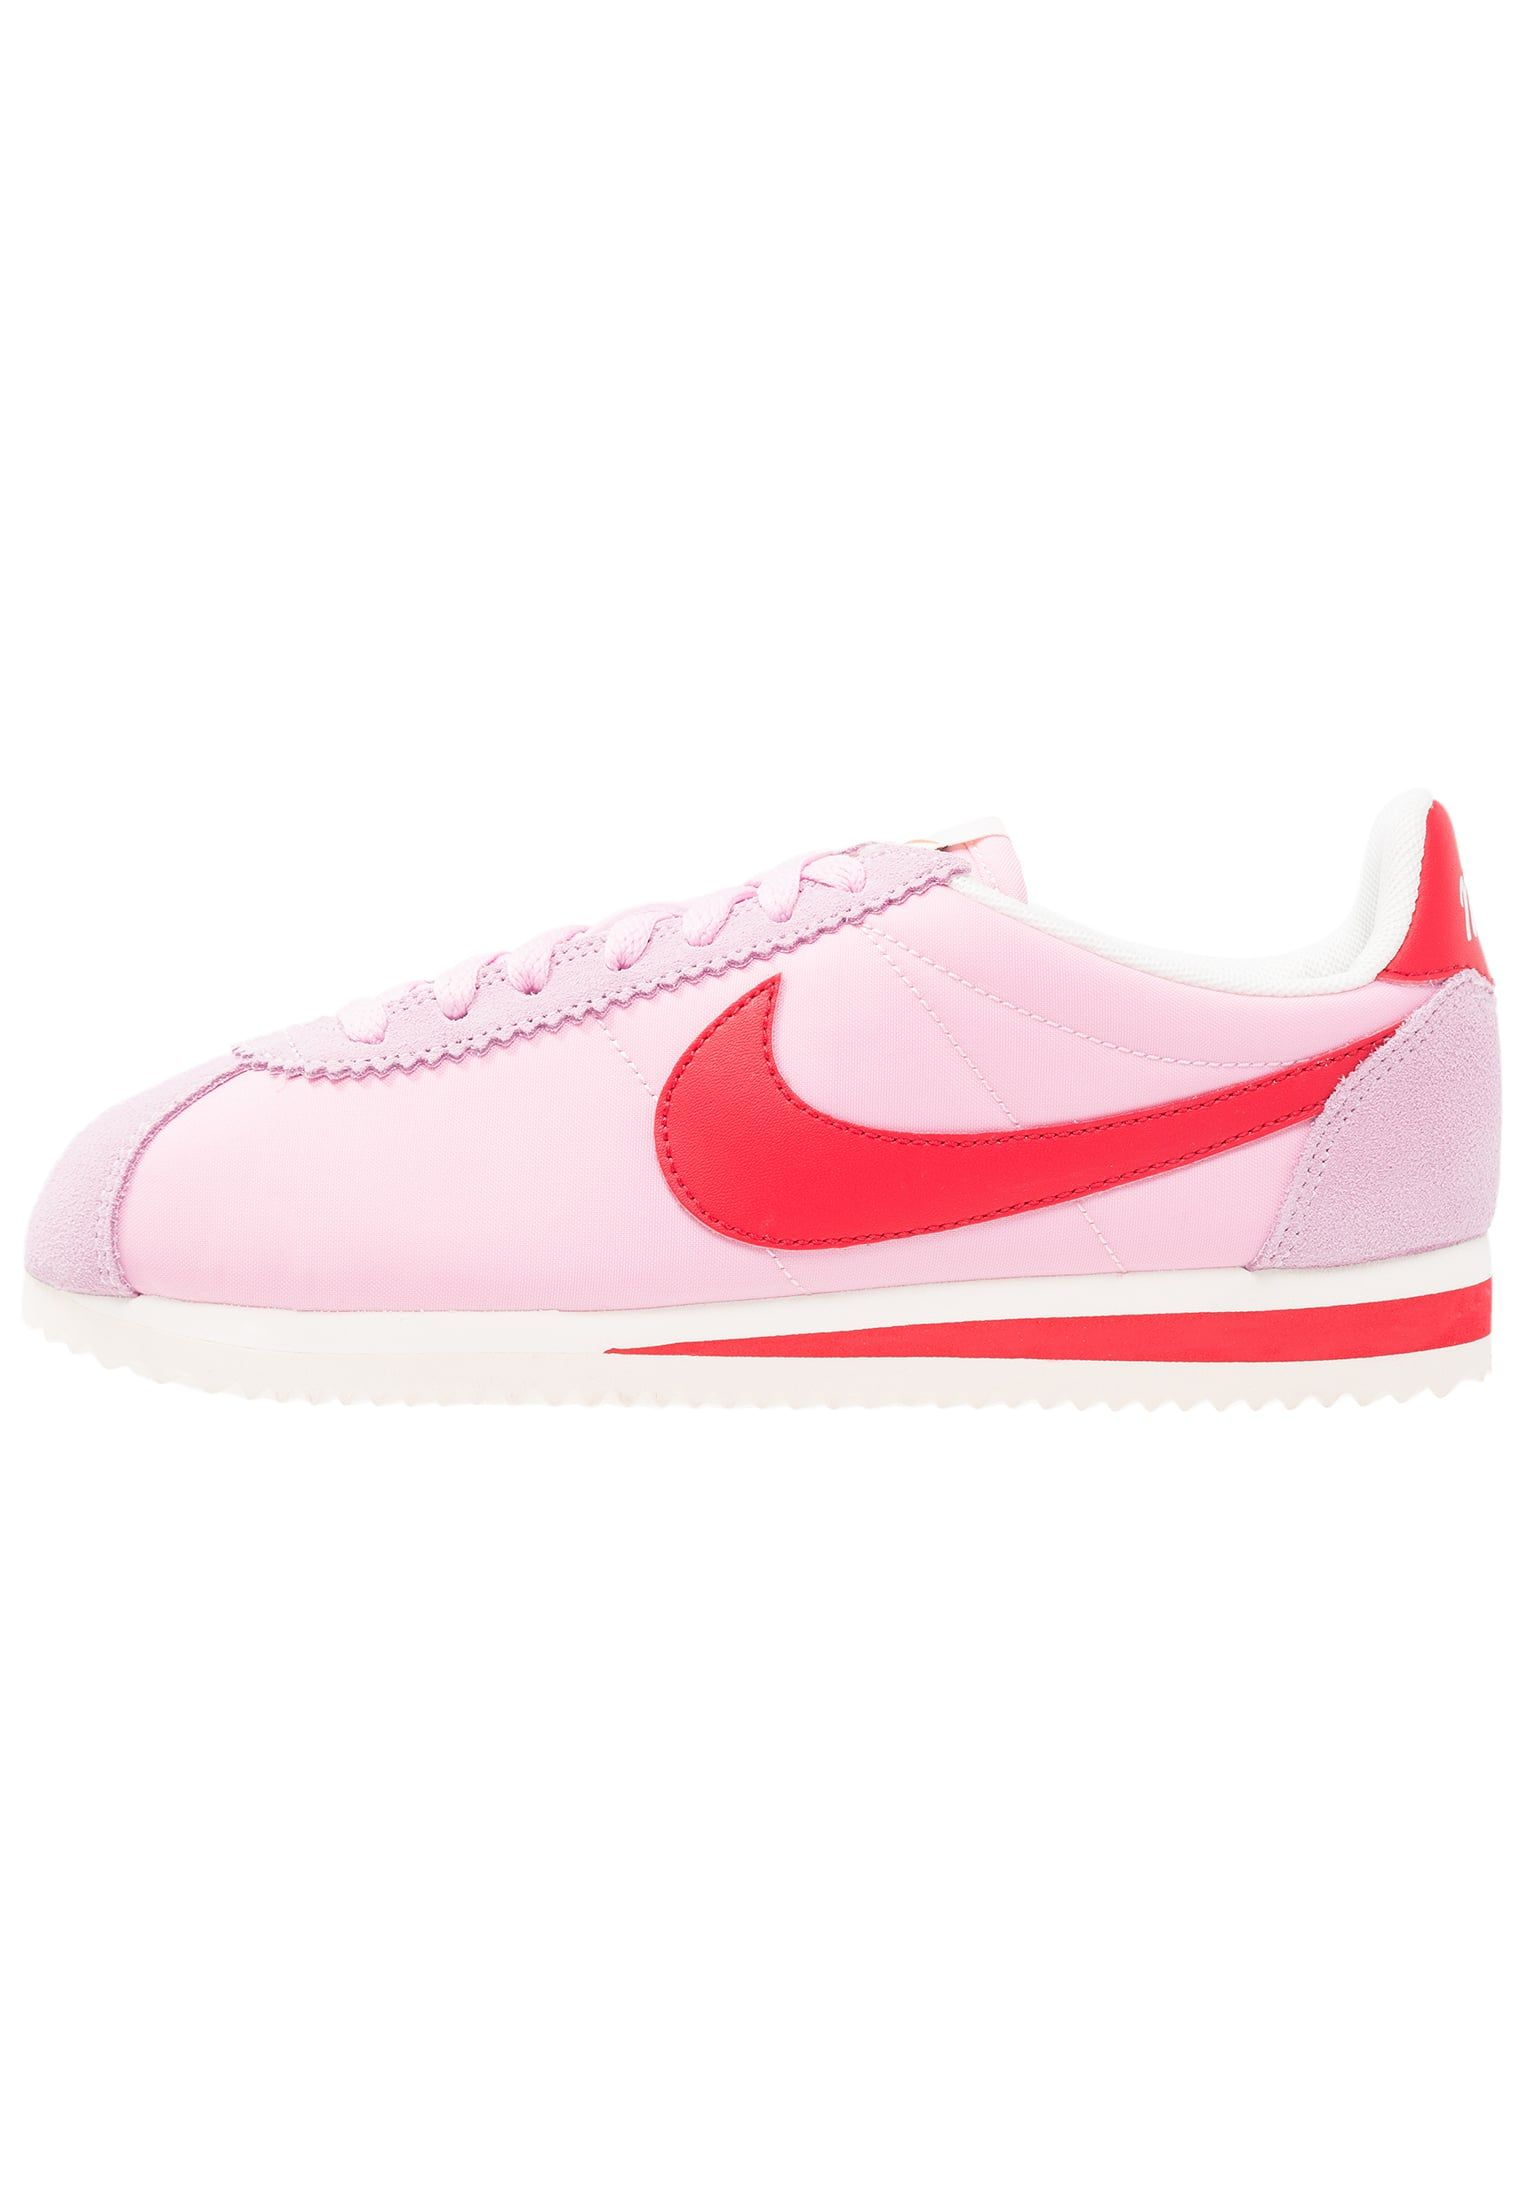 Nike – Classic Cortez Pink